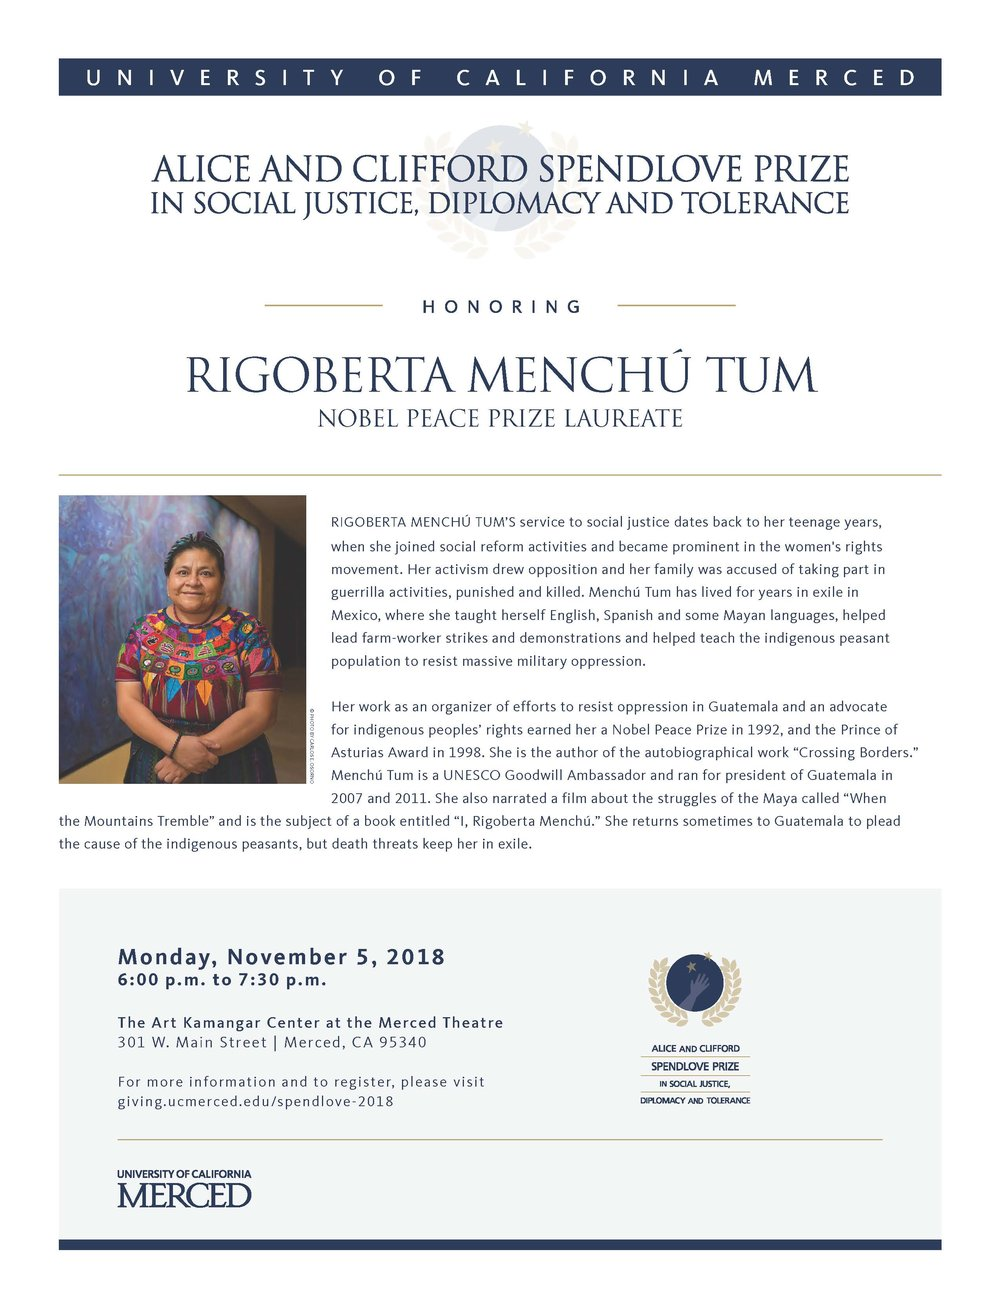 Rigoberta Tum Spendlove Flier jpeg (4) (5).jpg